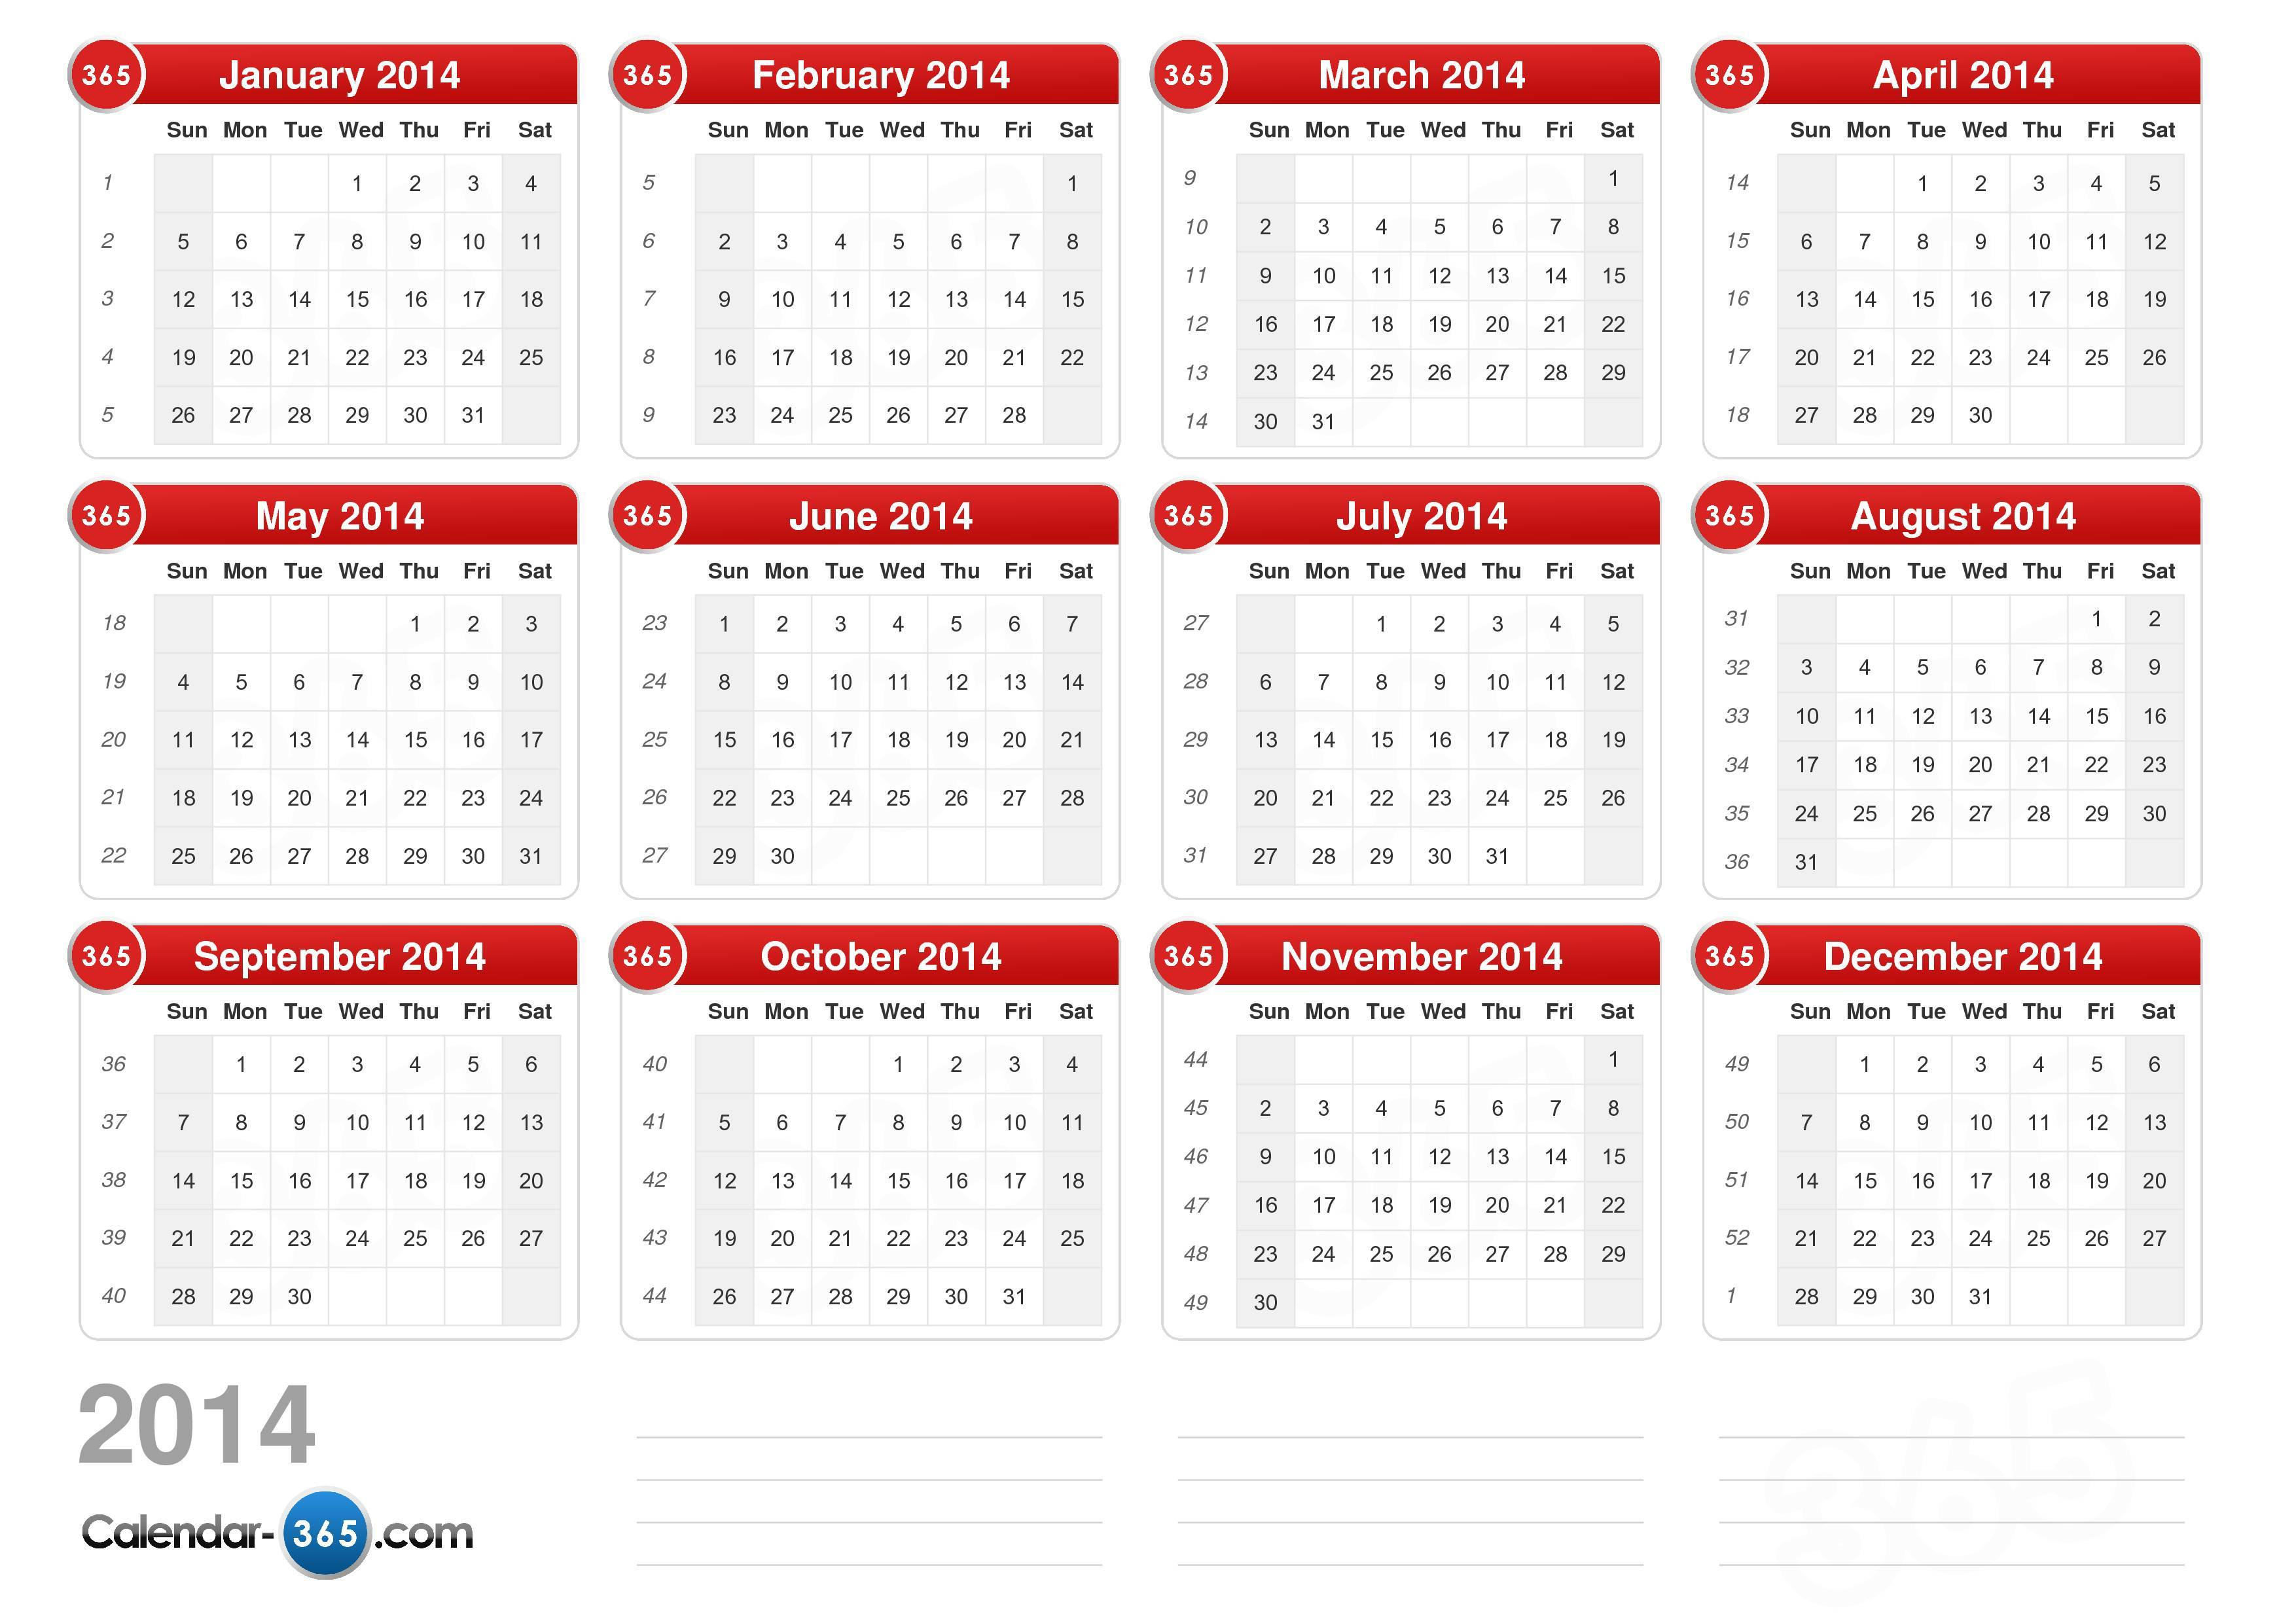 Free Online Calendars For 2014 2014 2015 Calendar Free Printable Two Year Word Calendars 2014 Calendar